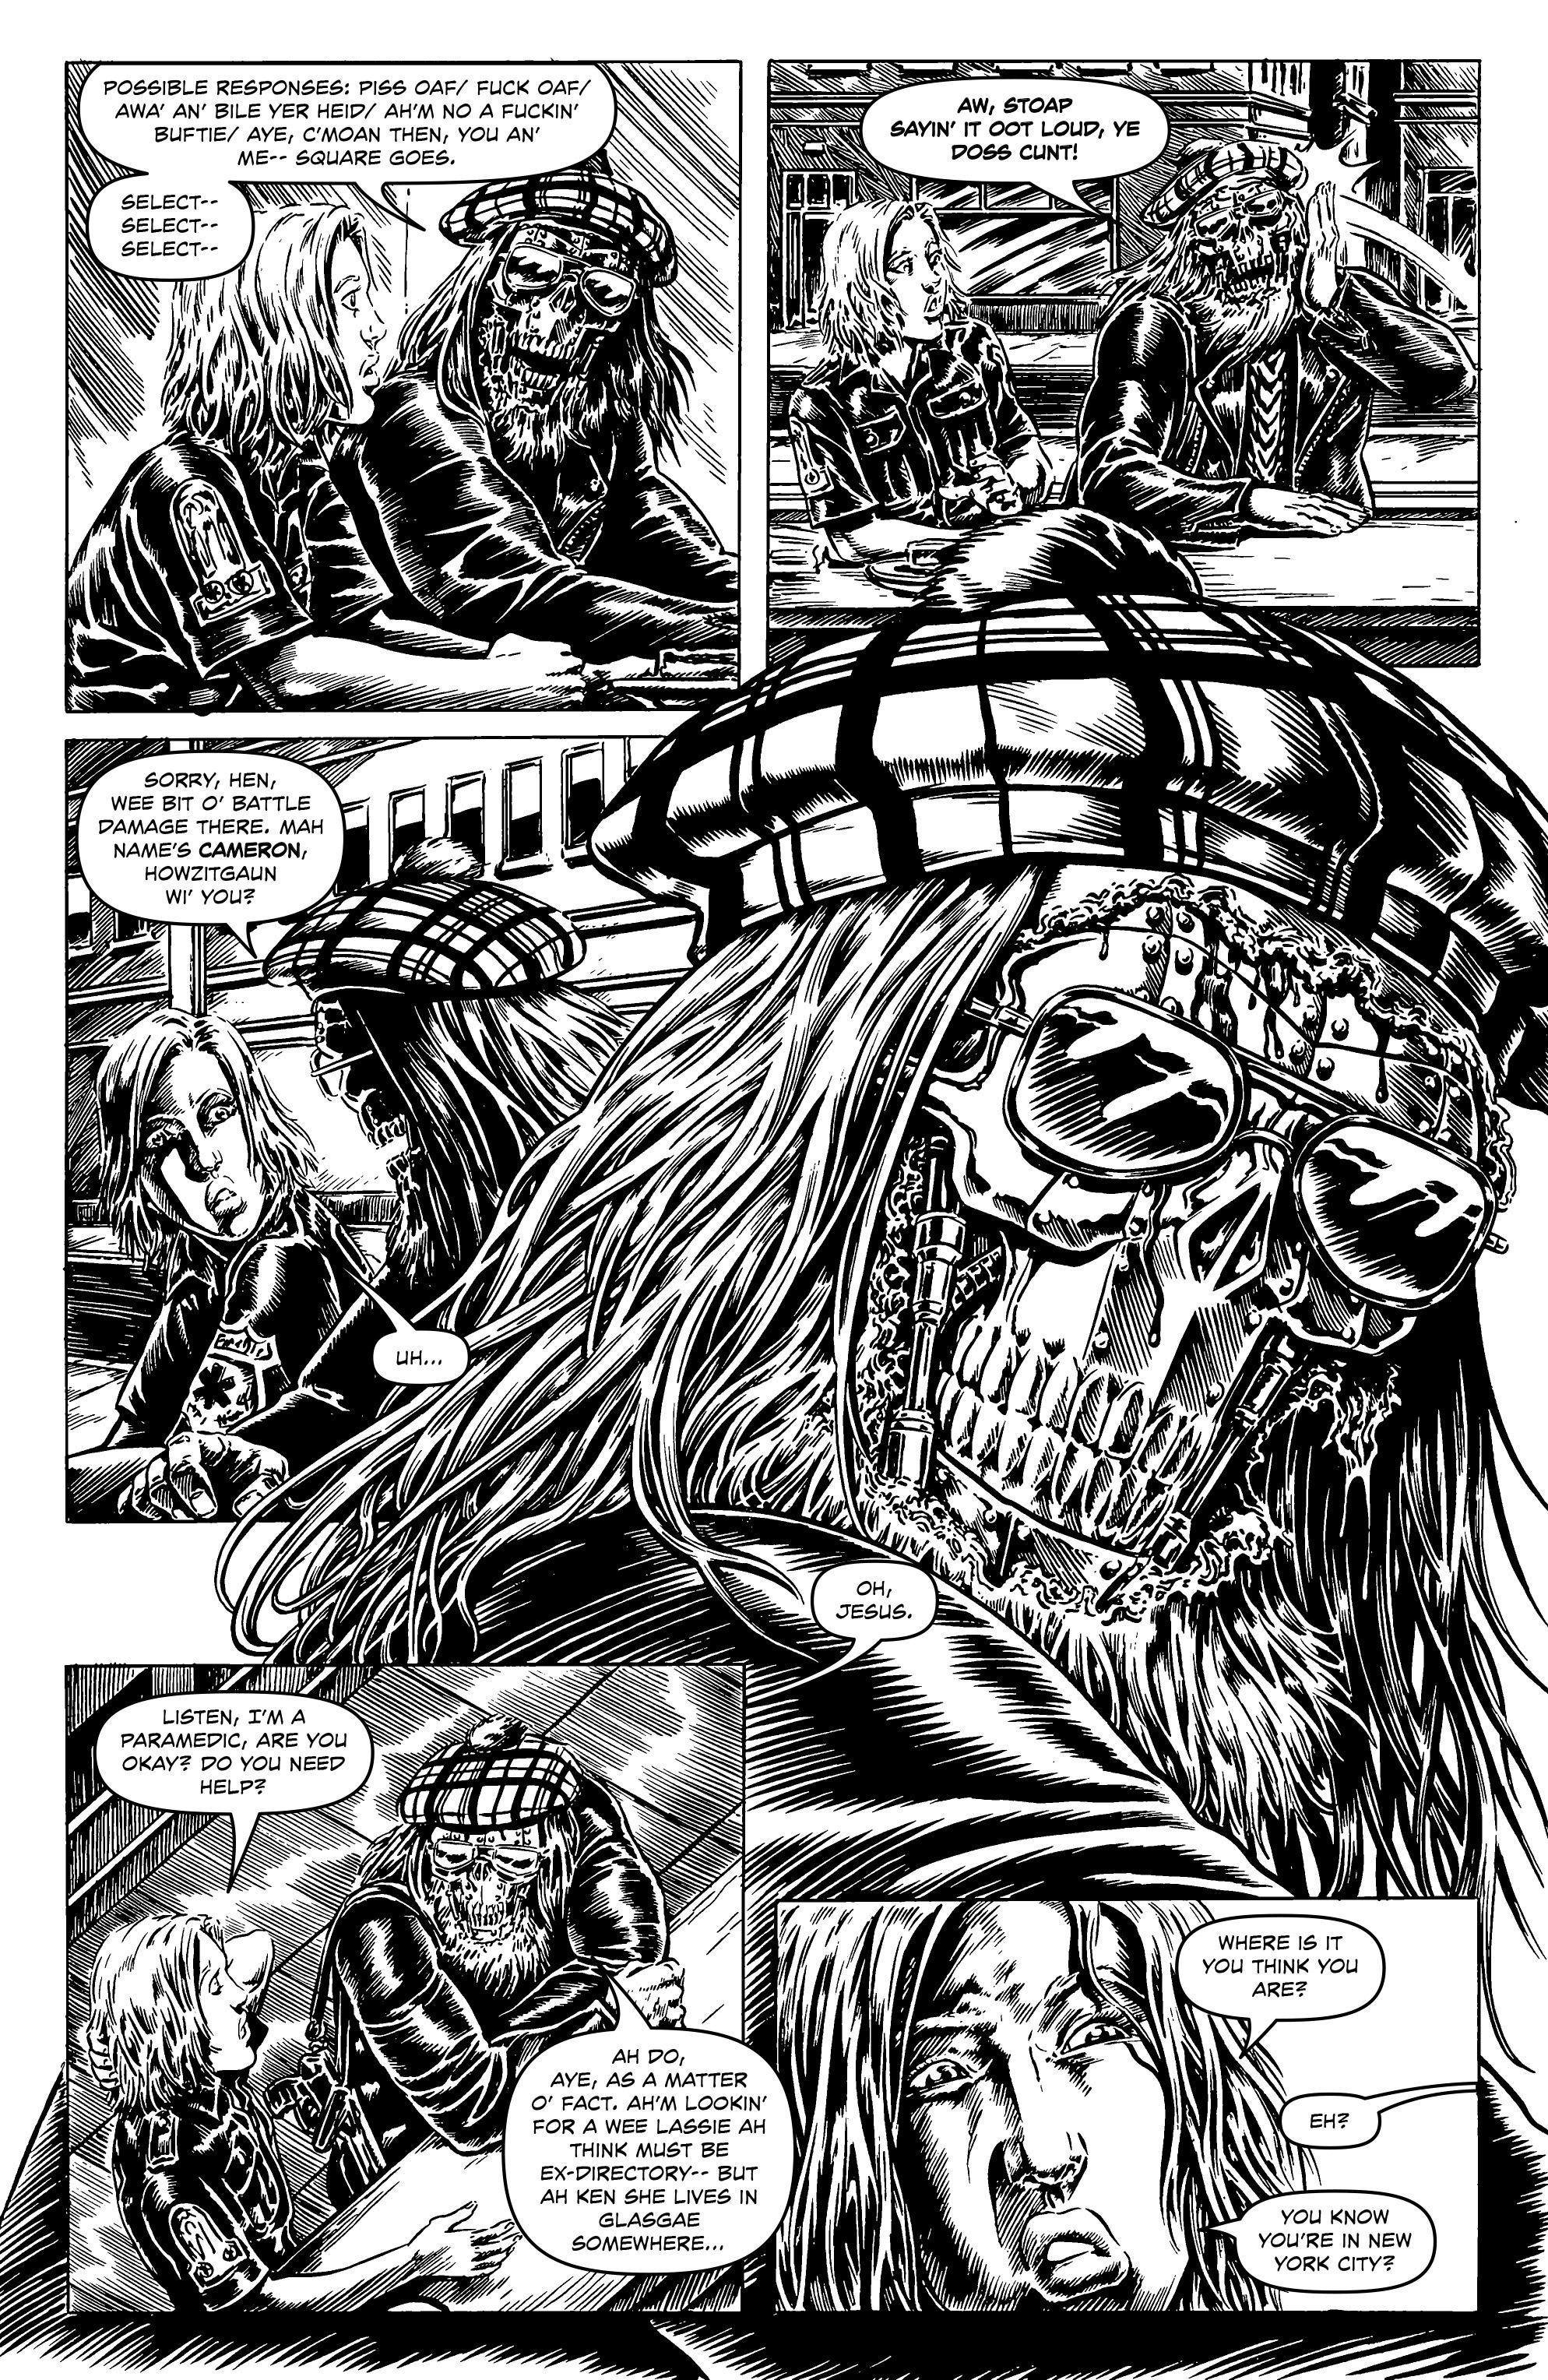 Read online Alan Moore's Cinema Purgatorio comic -  Issue #6 - 20